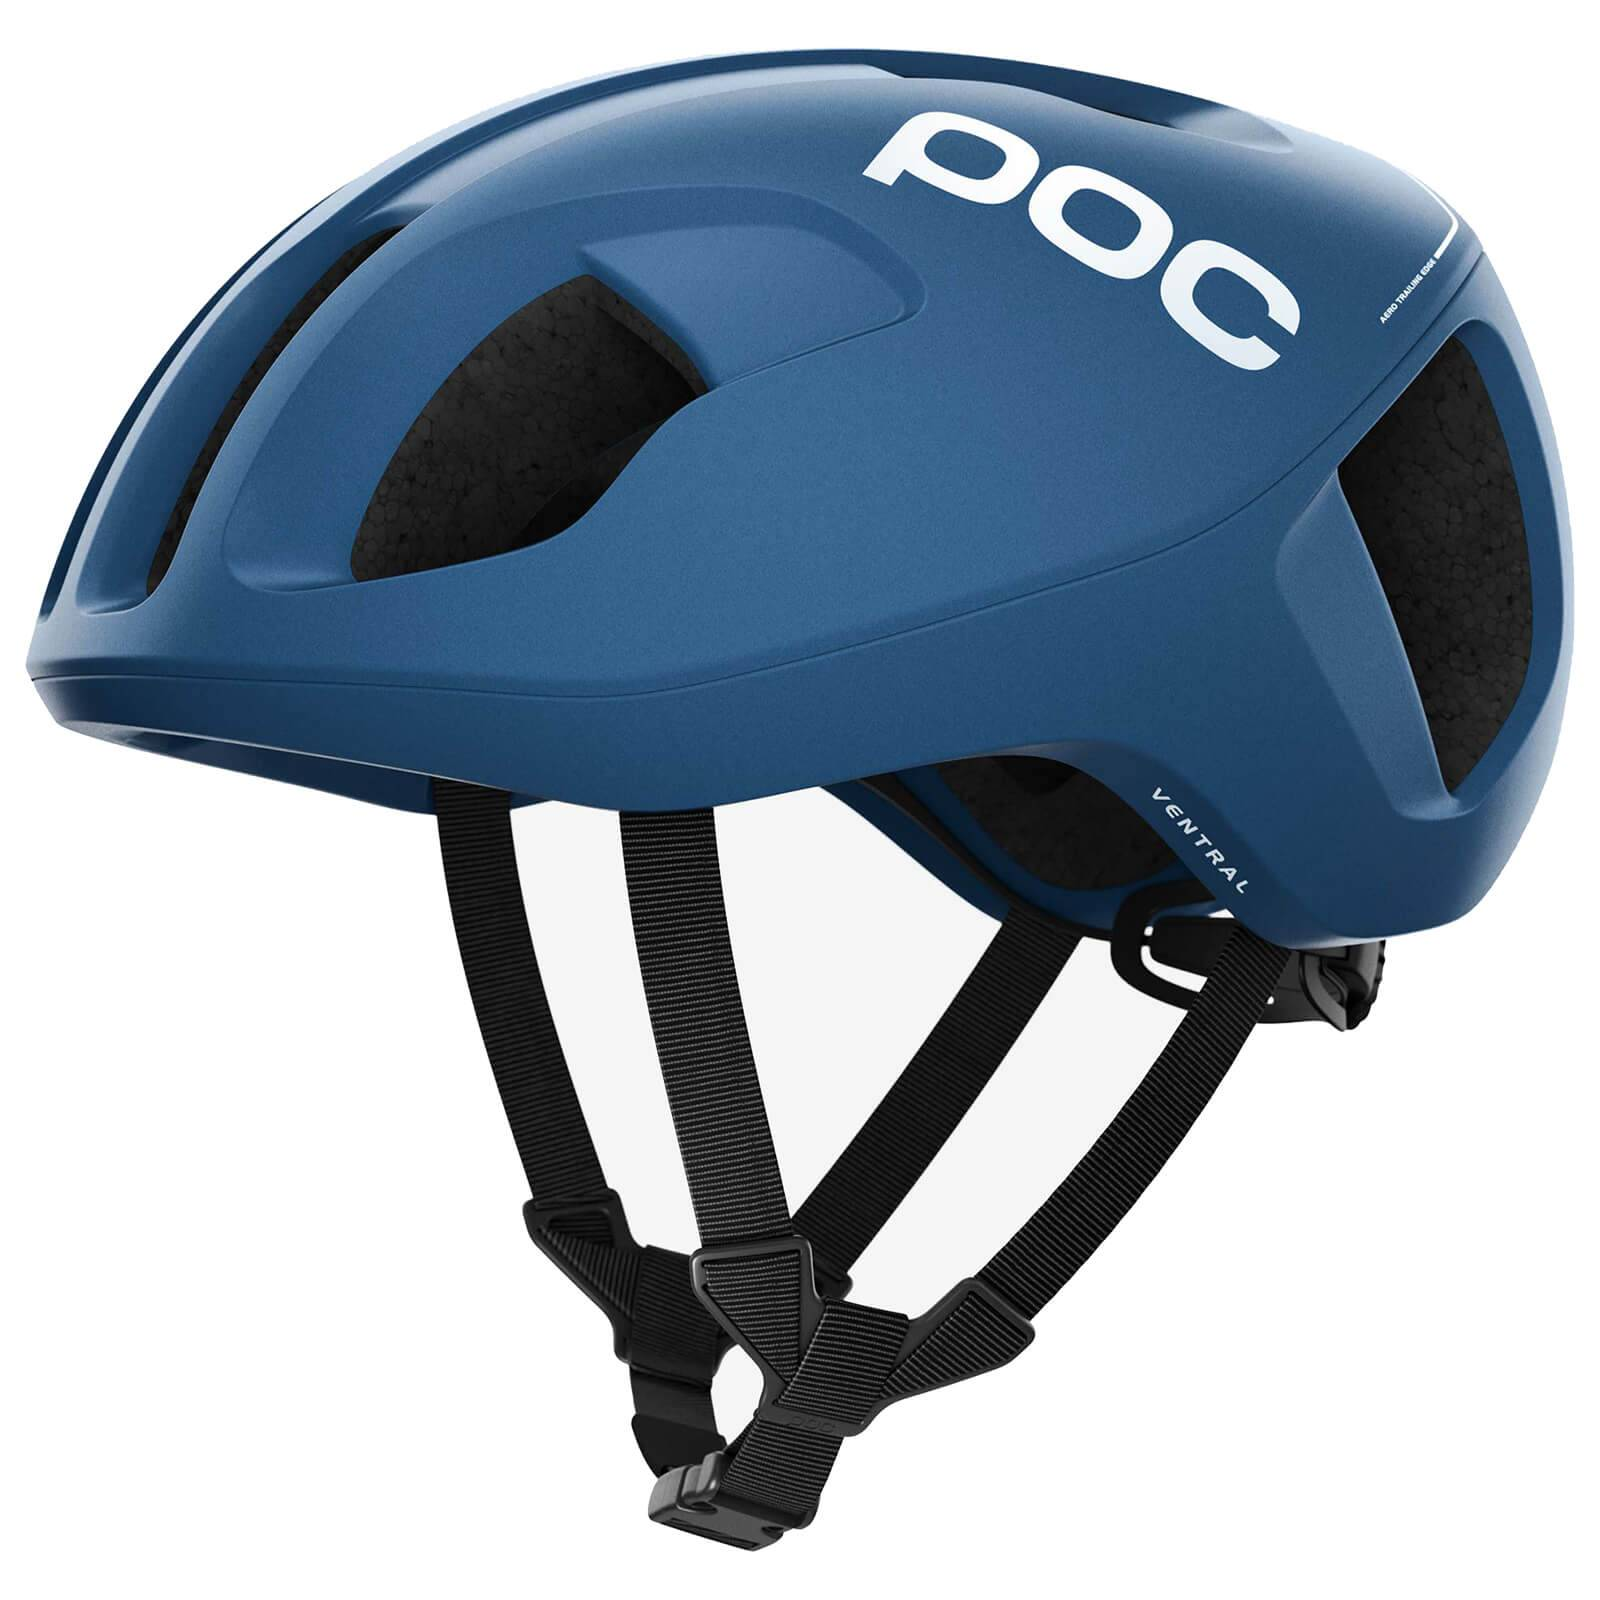 POC Ventral SPIN Helmet - M/54-60cm - Stibium Blue Matte